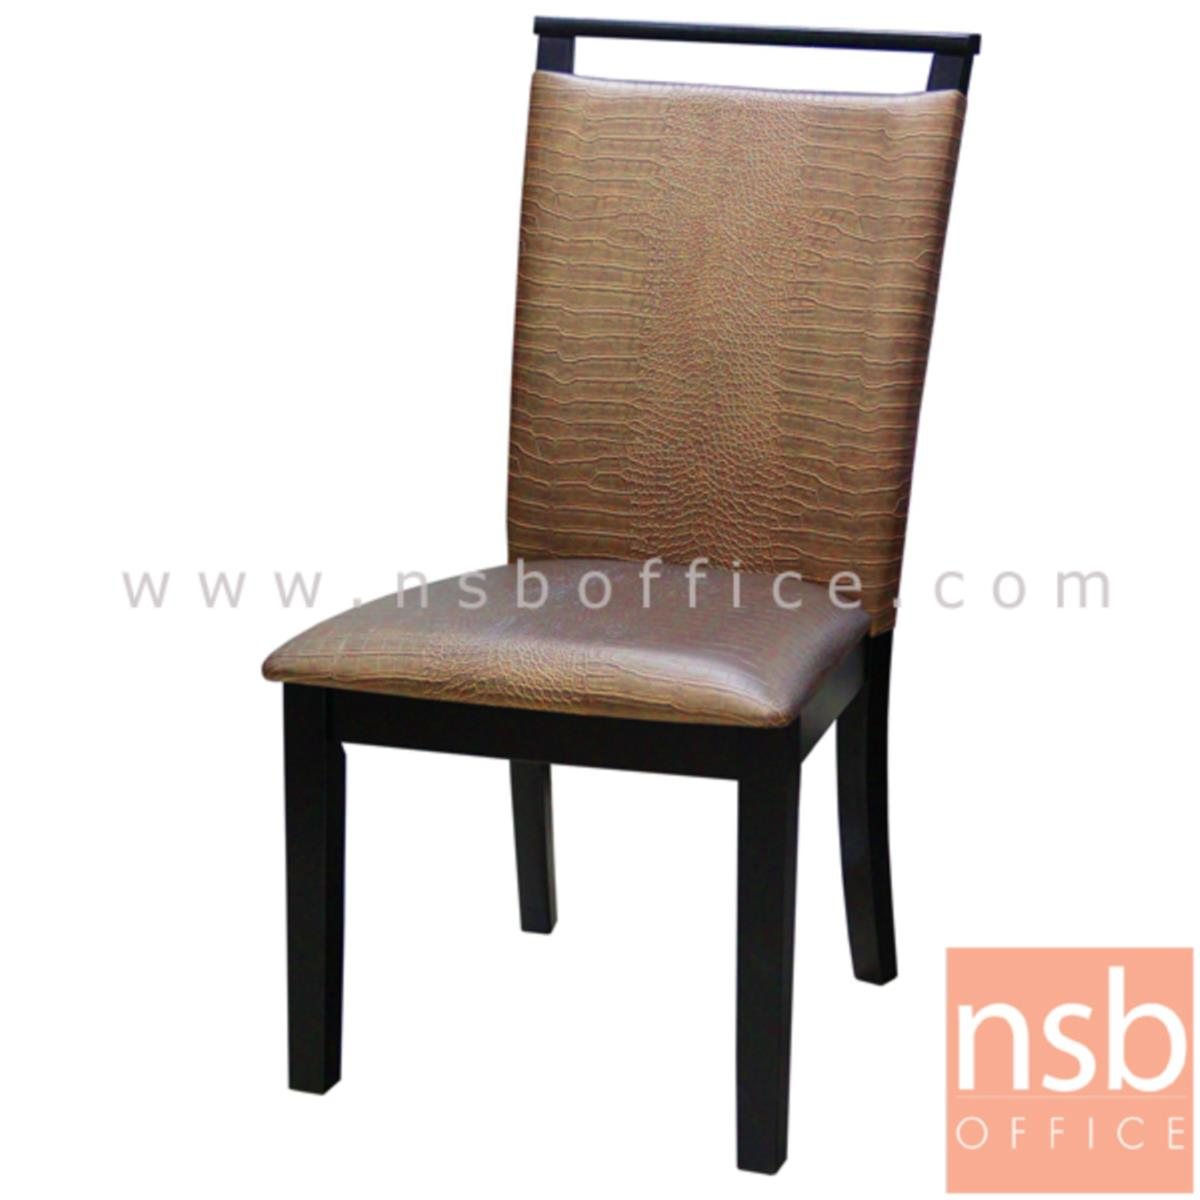 B22A122:เก้าอี้ไม้ที่นั่งหุ้มหนังเทียม รุ่น Bedingfield (เบดิงฟิลด์) ขาไม้